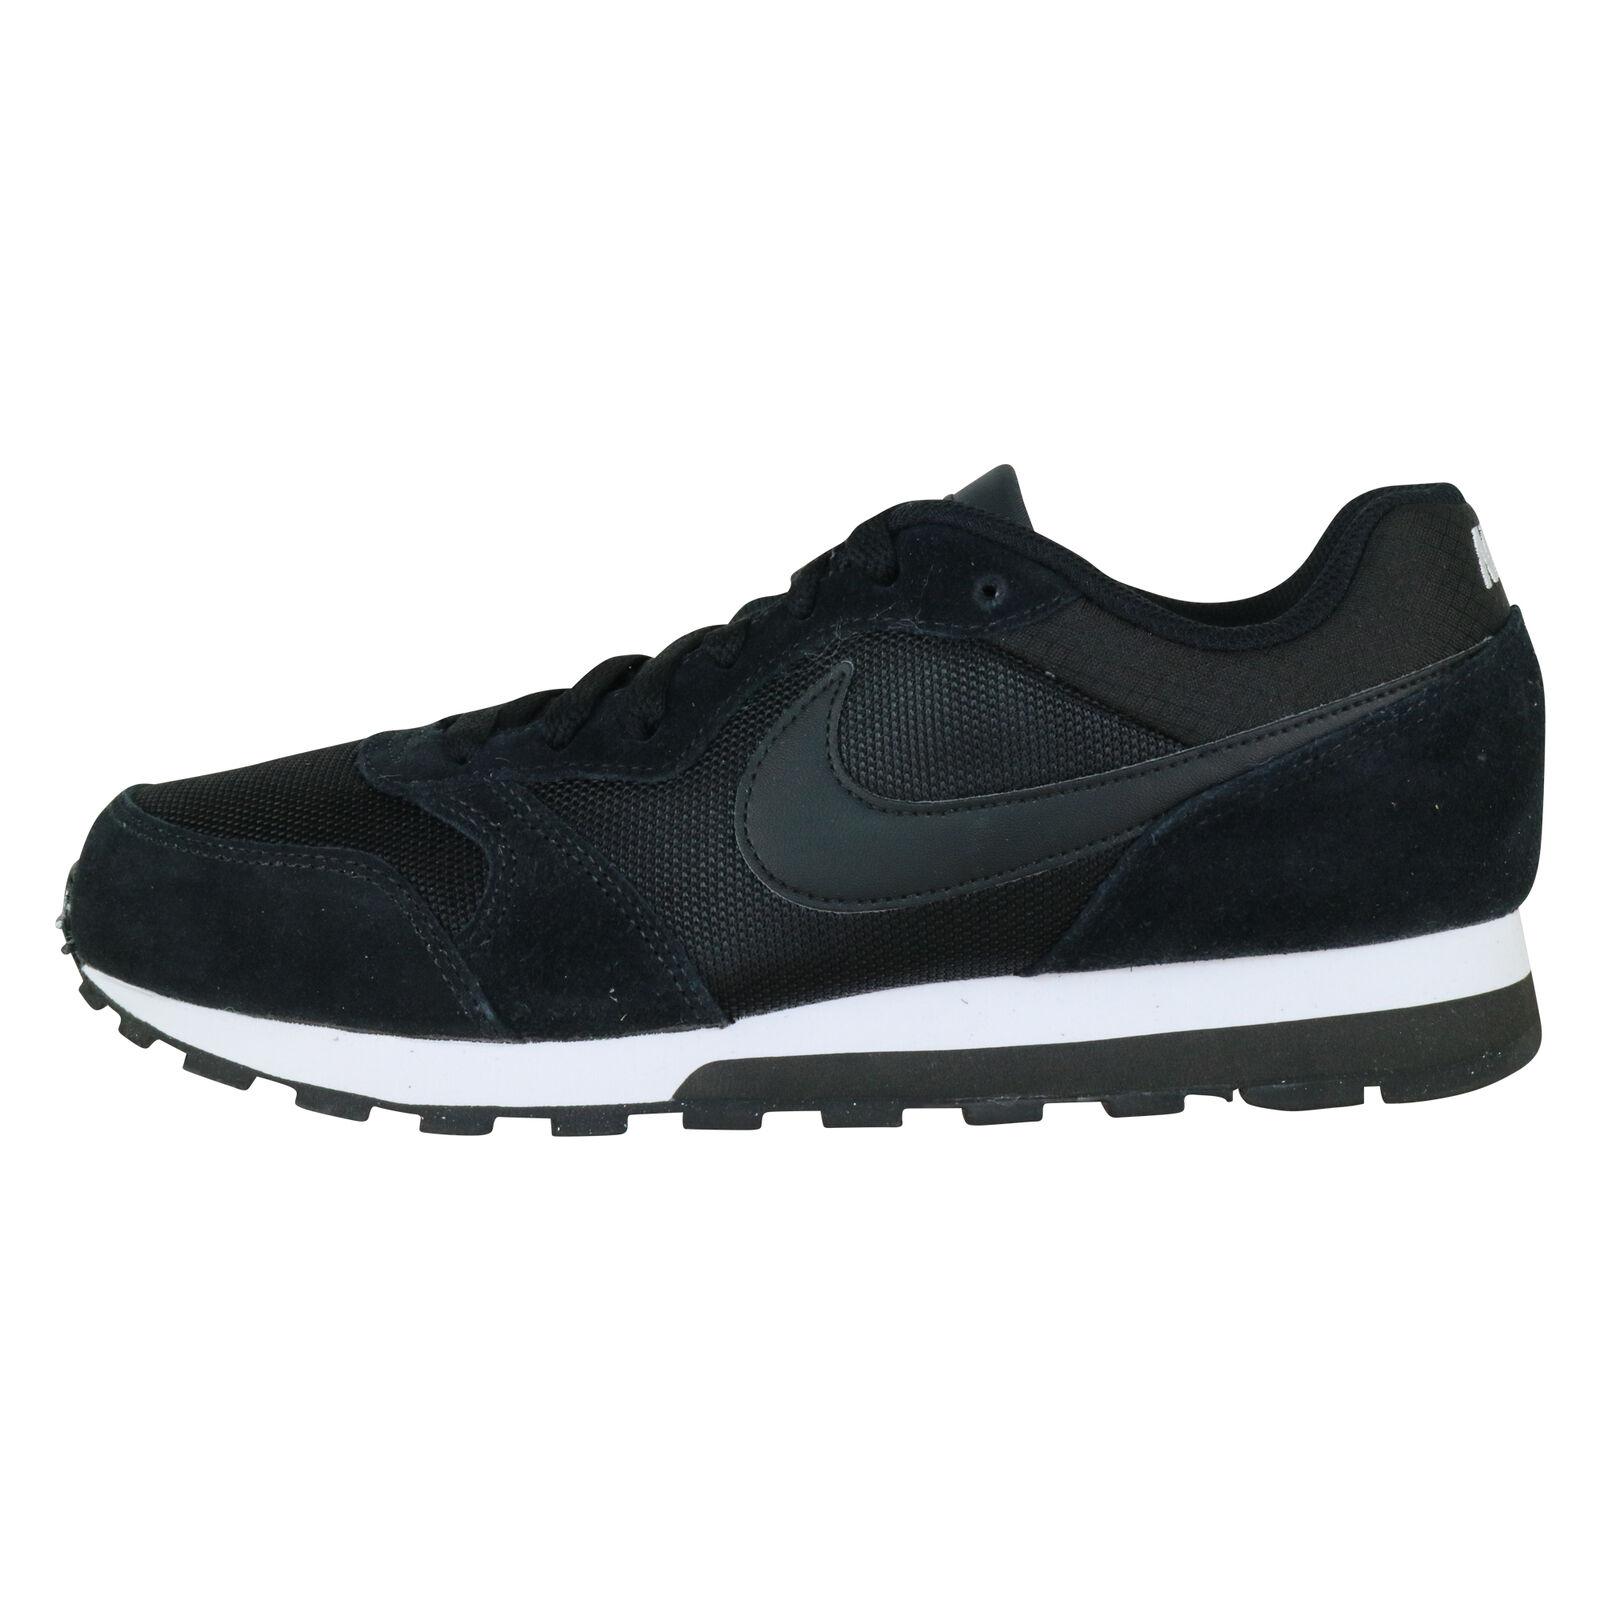 Nike MD Runner 2 Damens Damen Freizeitschuhe Sneaker 749869-001